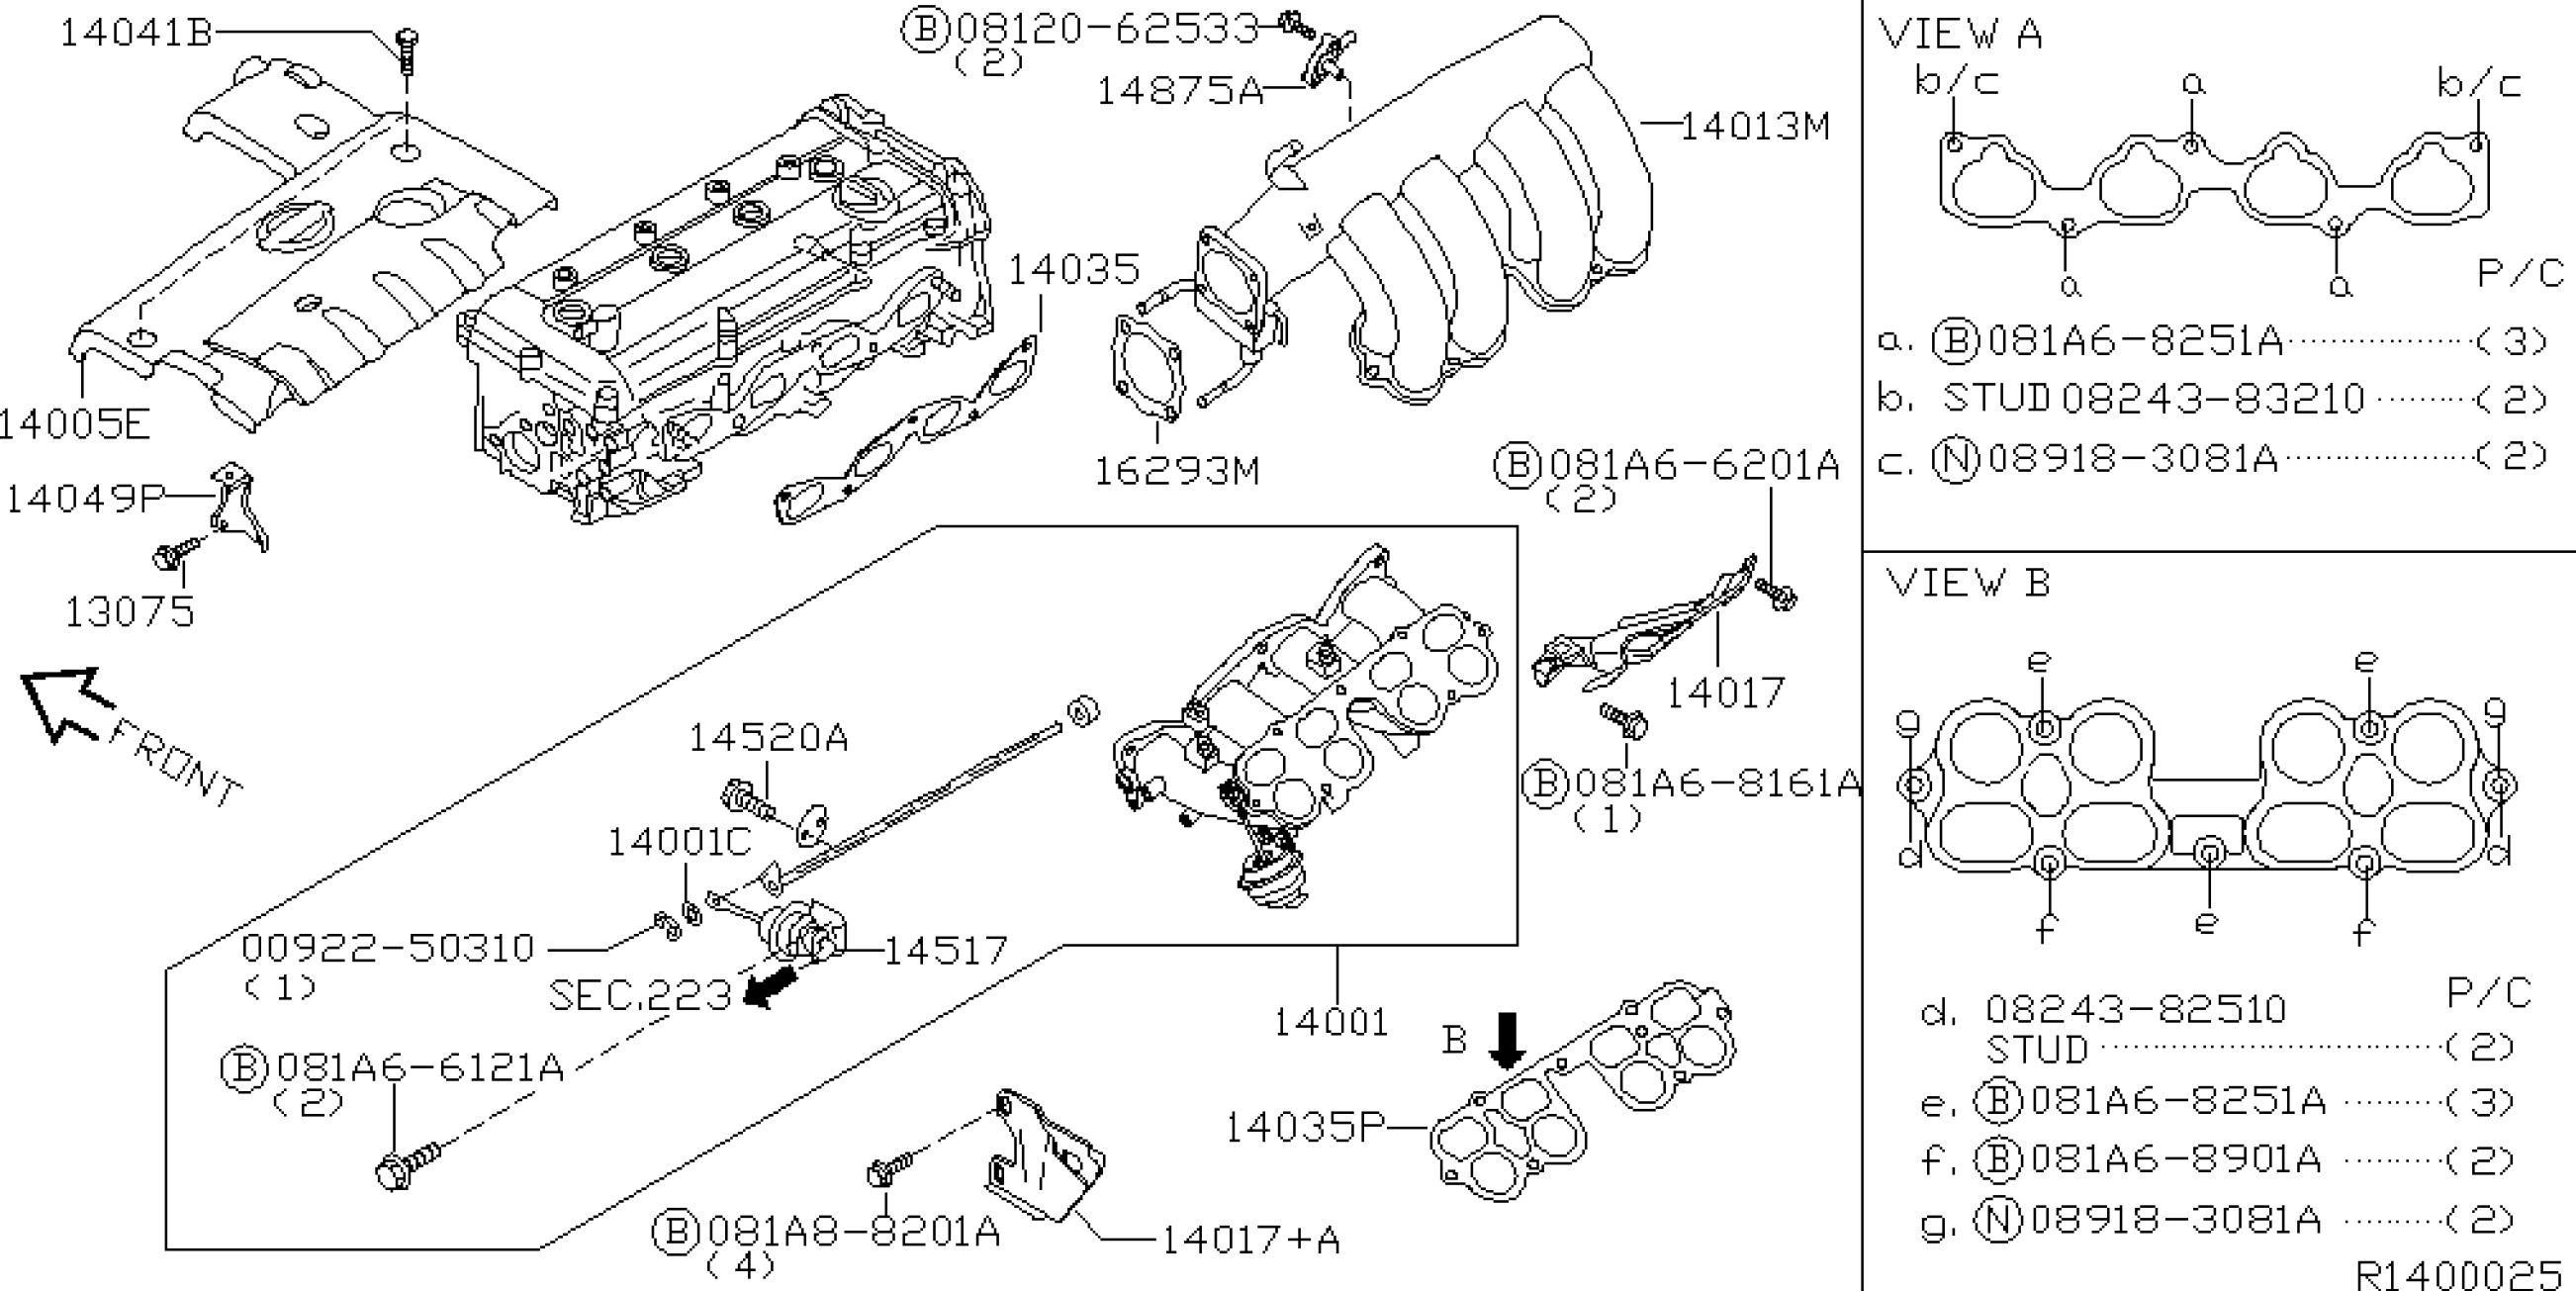 2005 nissan altima engine diagram nissan sentra engine diagram 1997 rh detoxicrecenze com 1997 Nissan Altima Oil Change 2002 Nissan Altima Engine Diagram